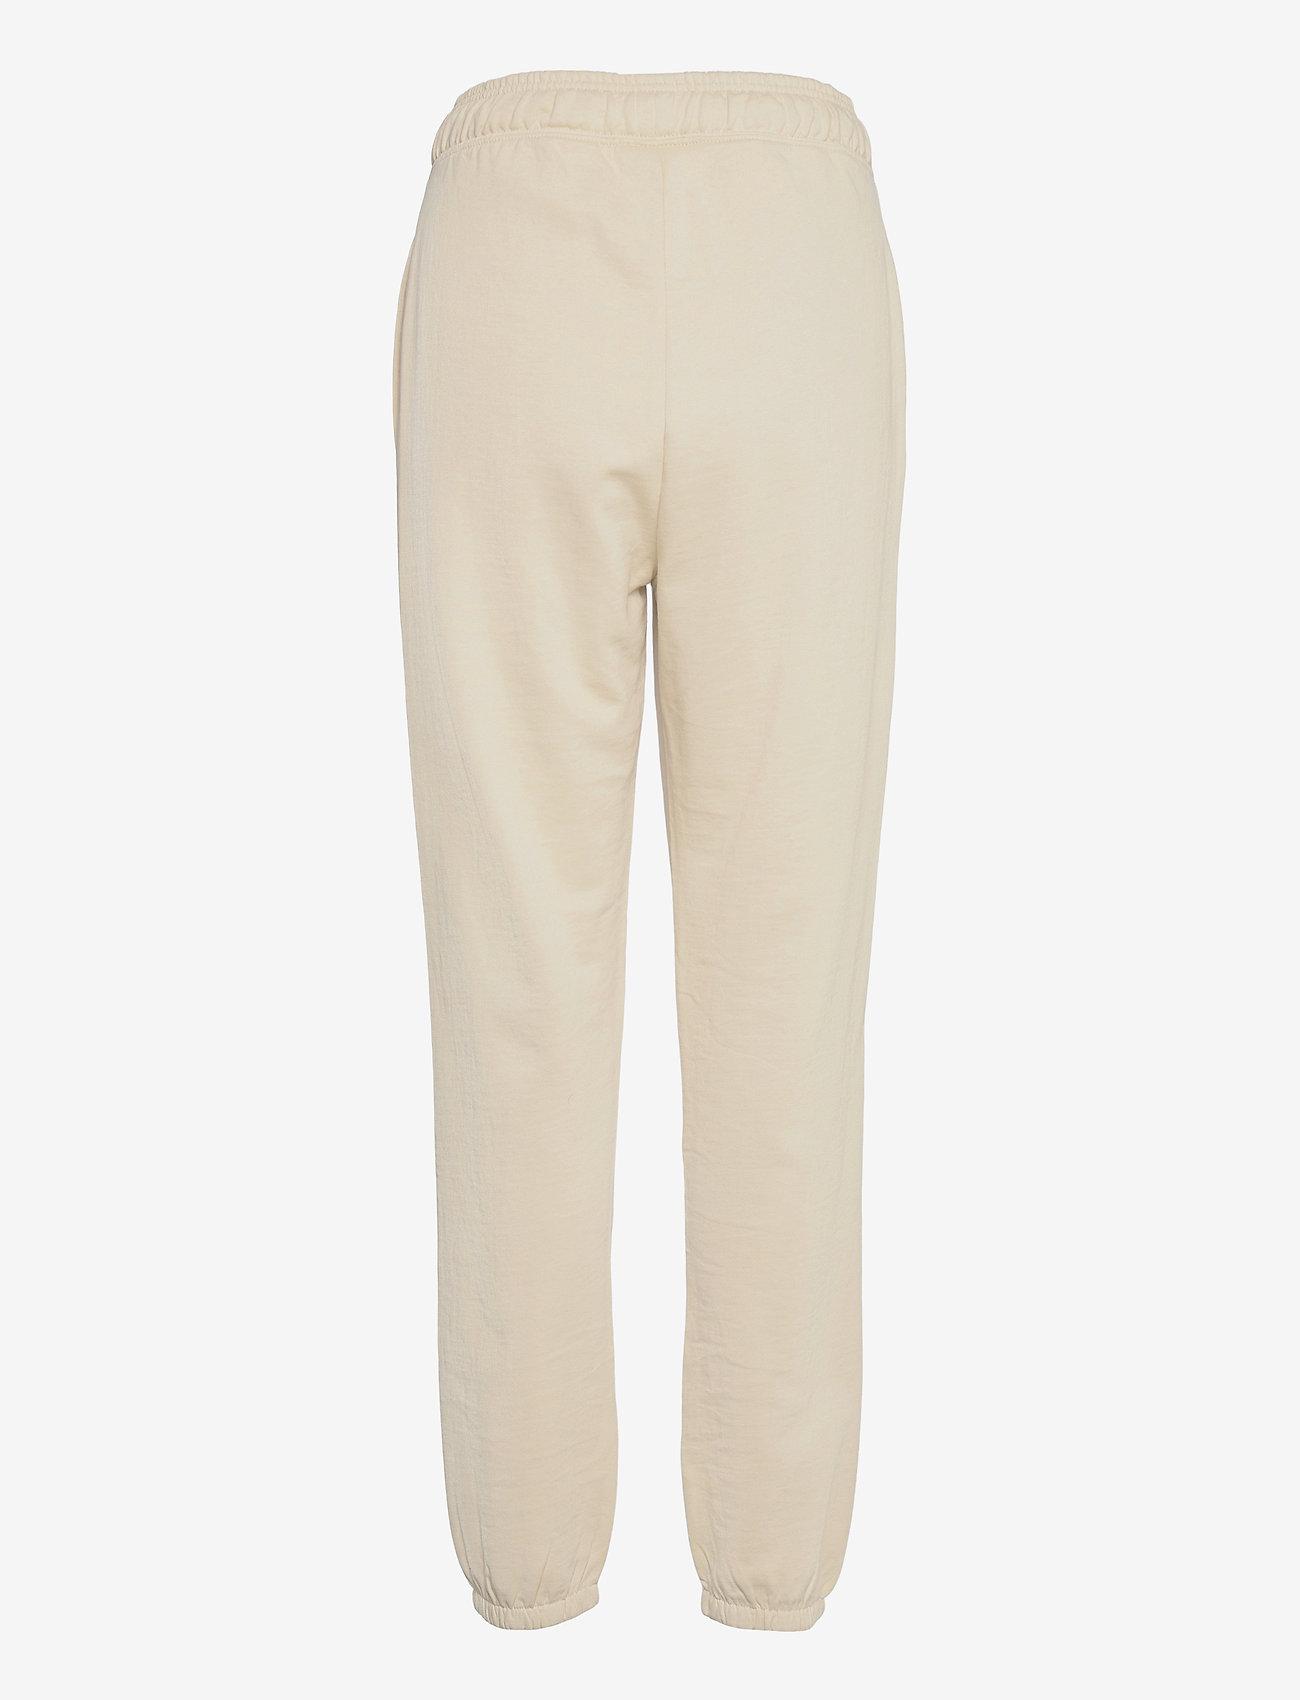 Vero Moda - VMODEZ HW SWEAT PANTS VMA - kläder - oatmeal - 1